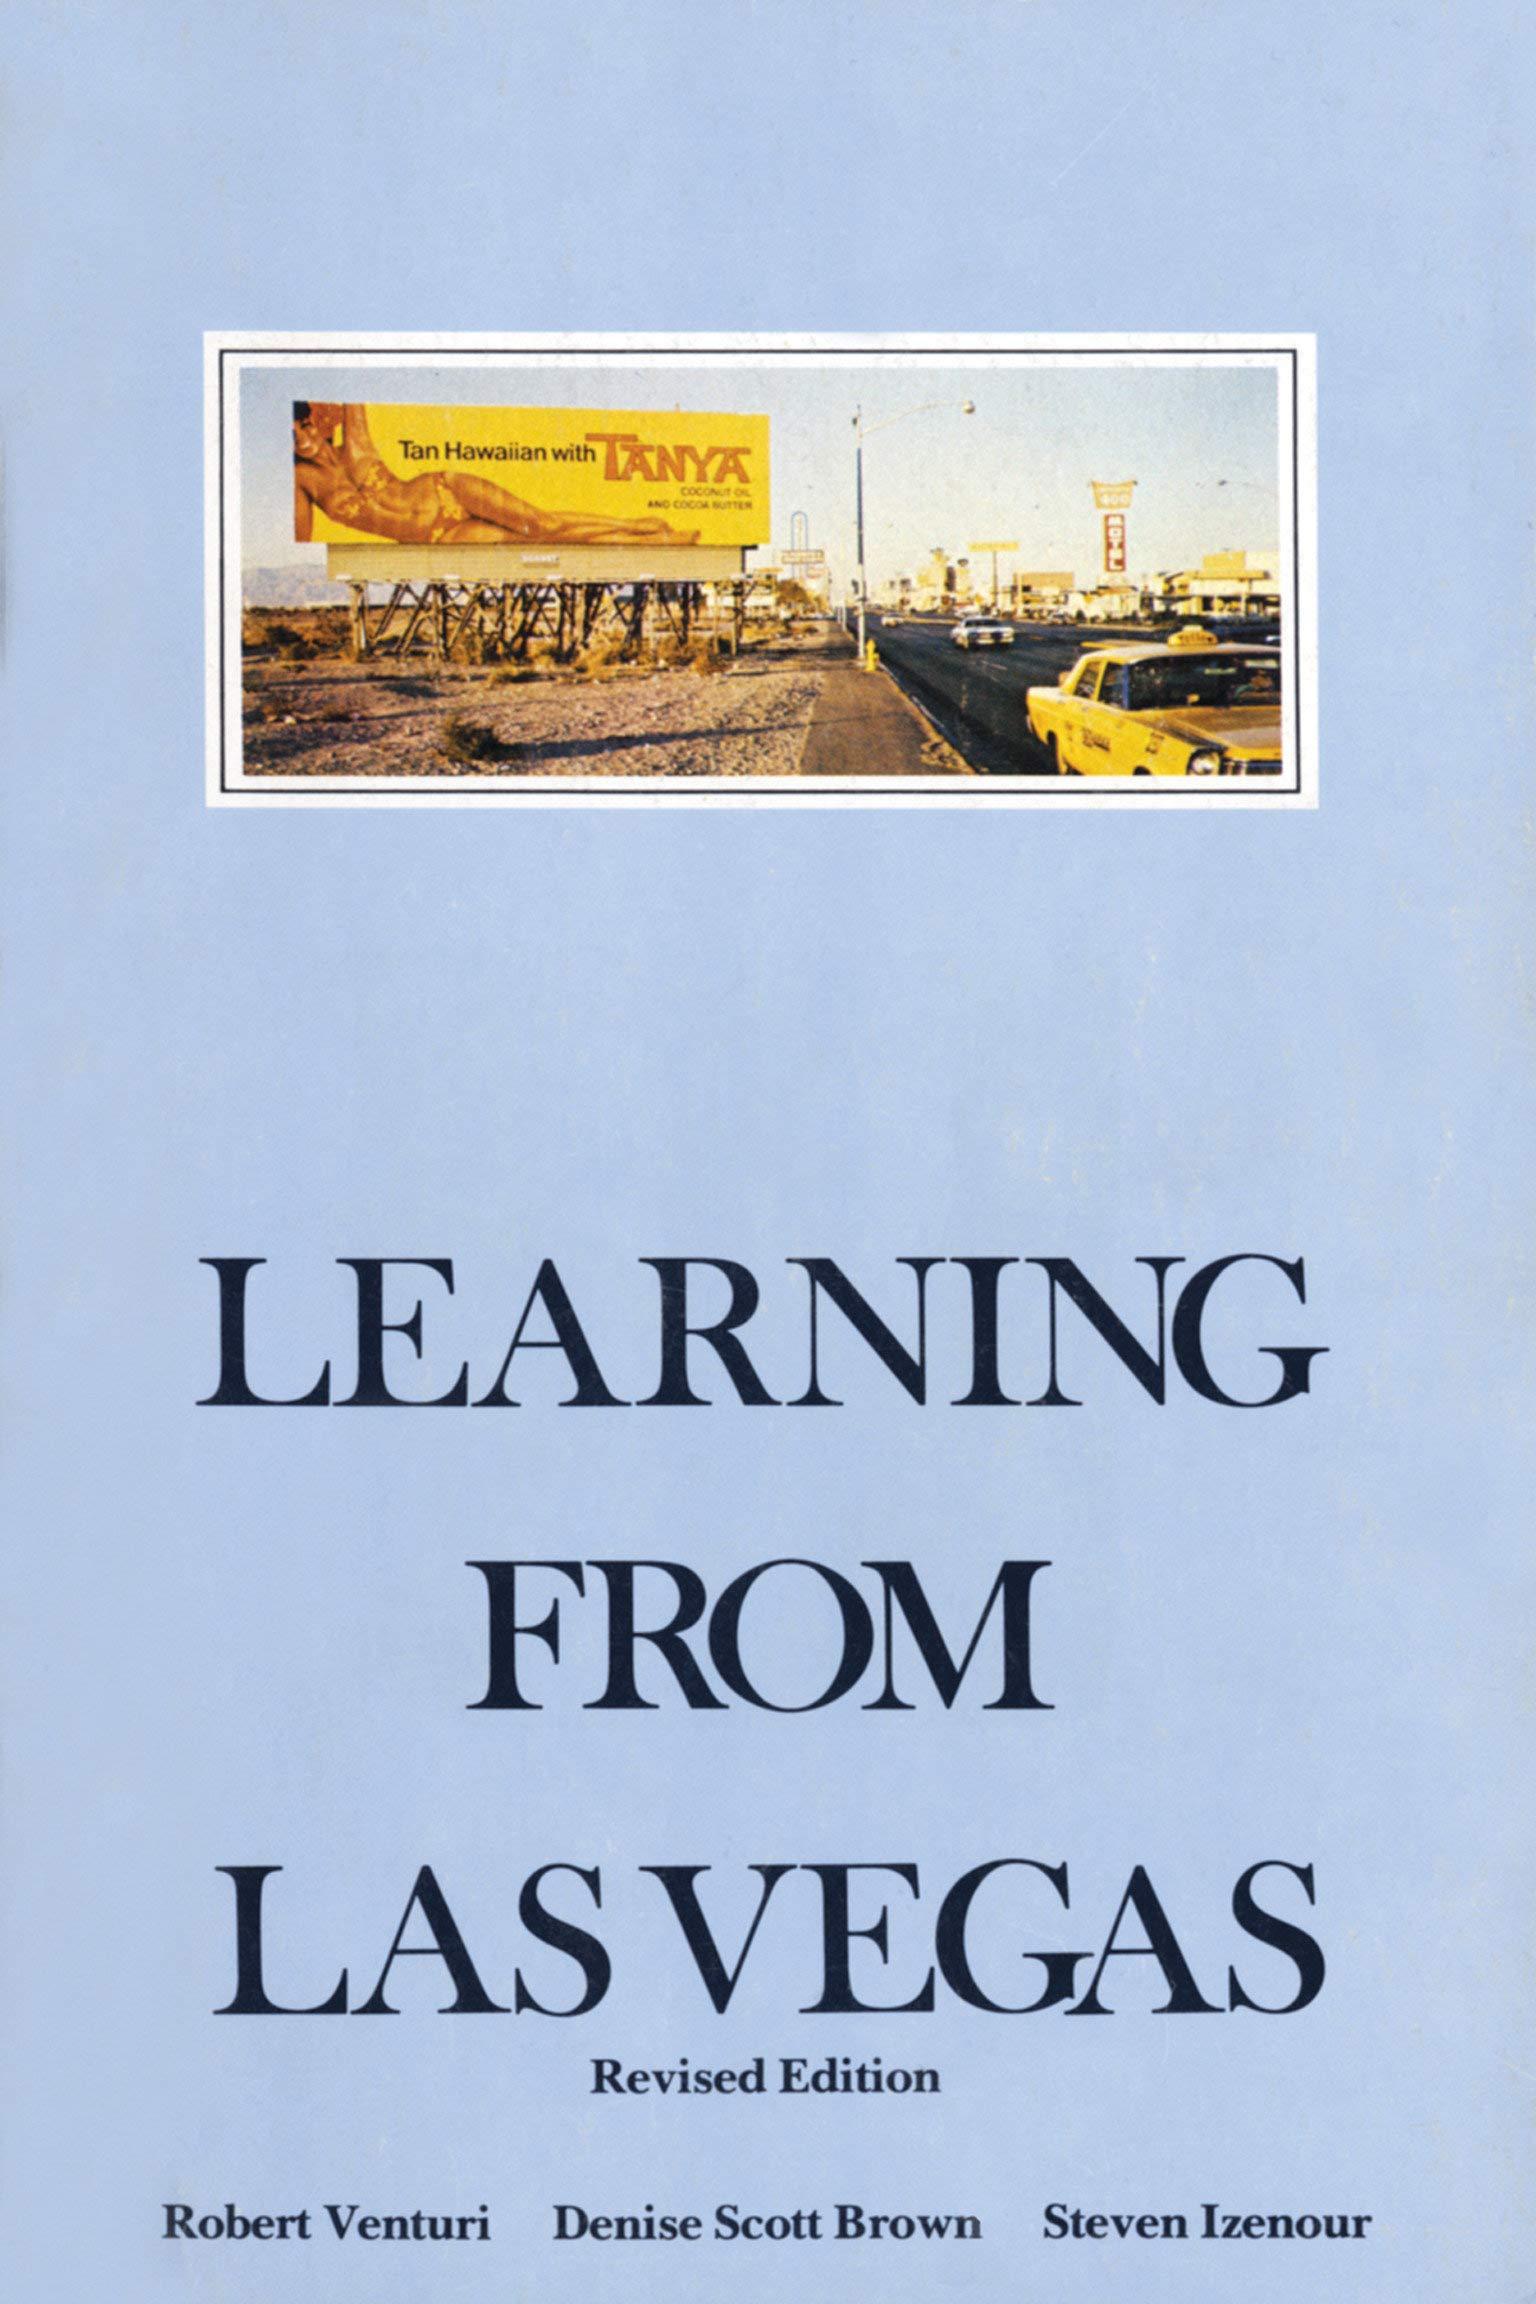 Обложка книги«Уроки Лас-Вегаса»